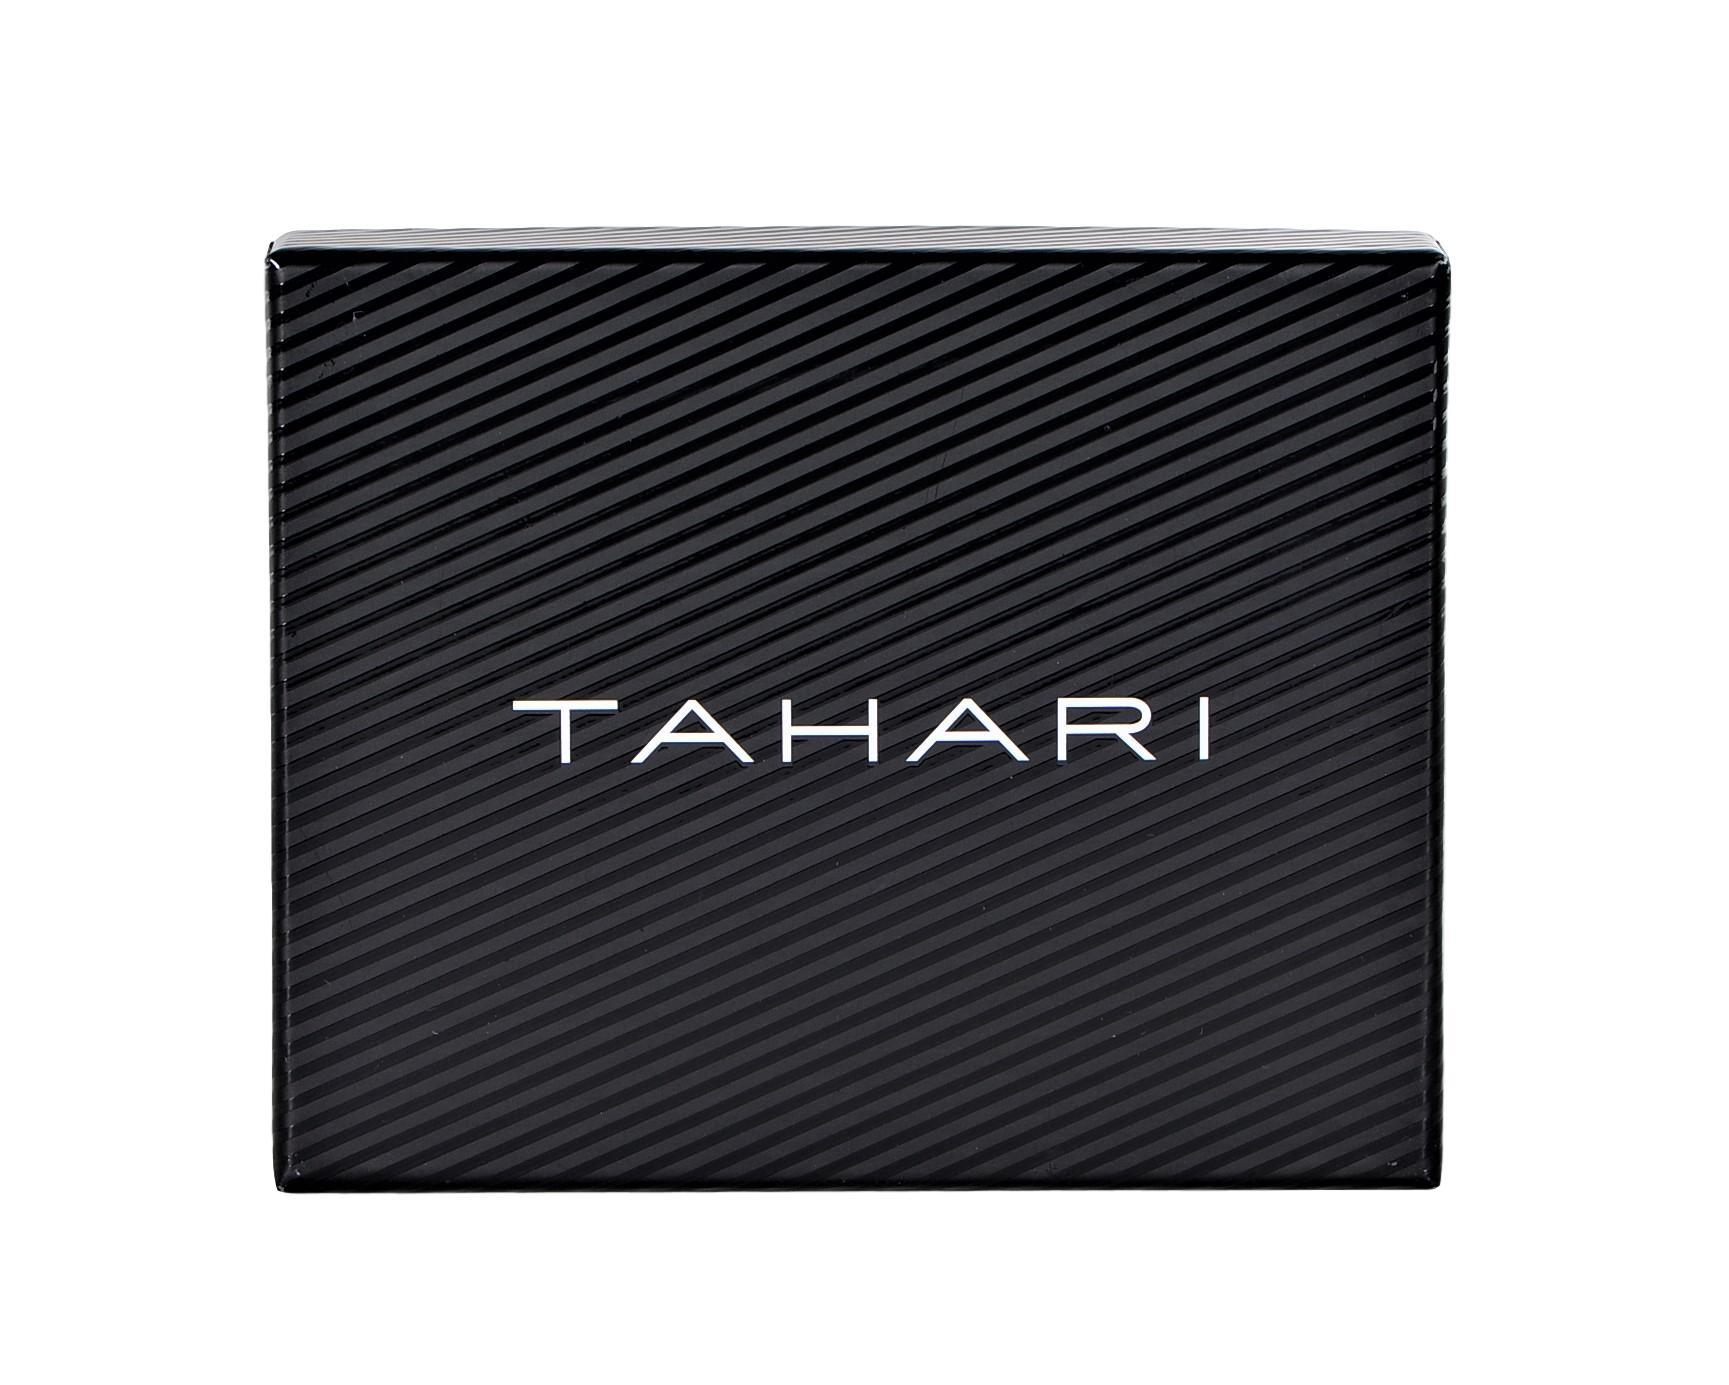 Tahari-Men-039-s-RFID-Security-Blocking-Leather-Glove-Trifold-Wallet thumbnail 11